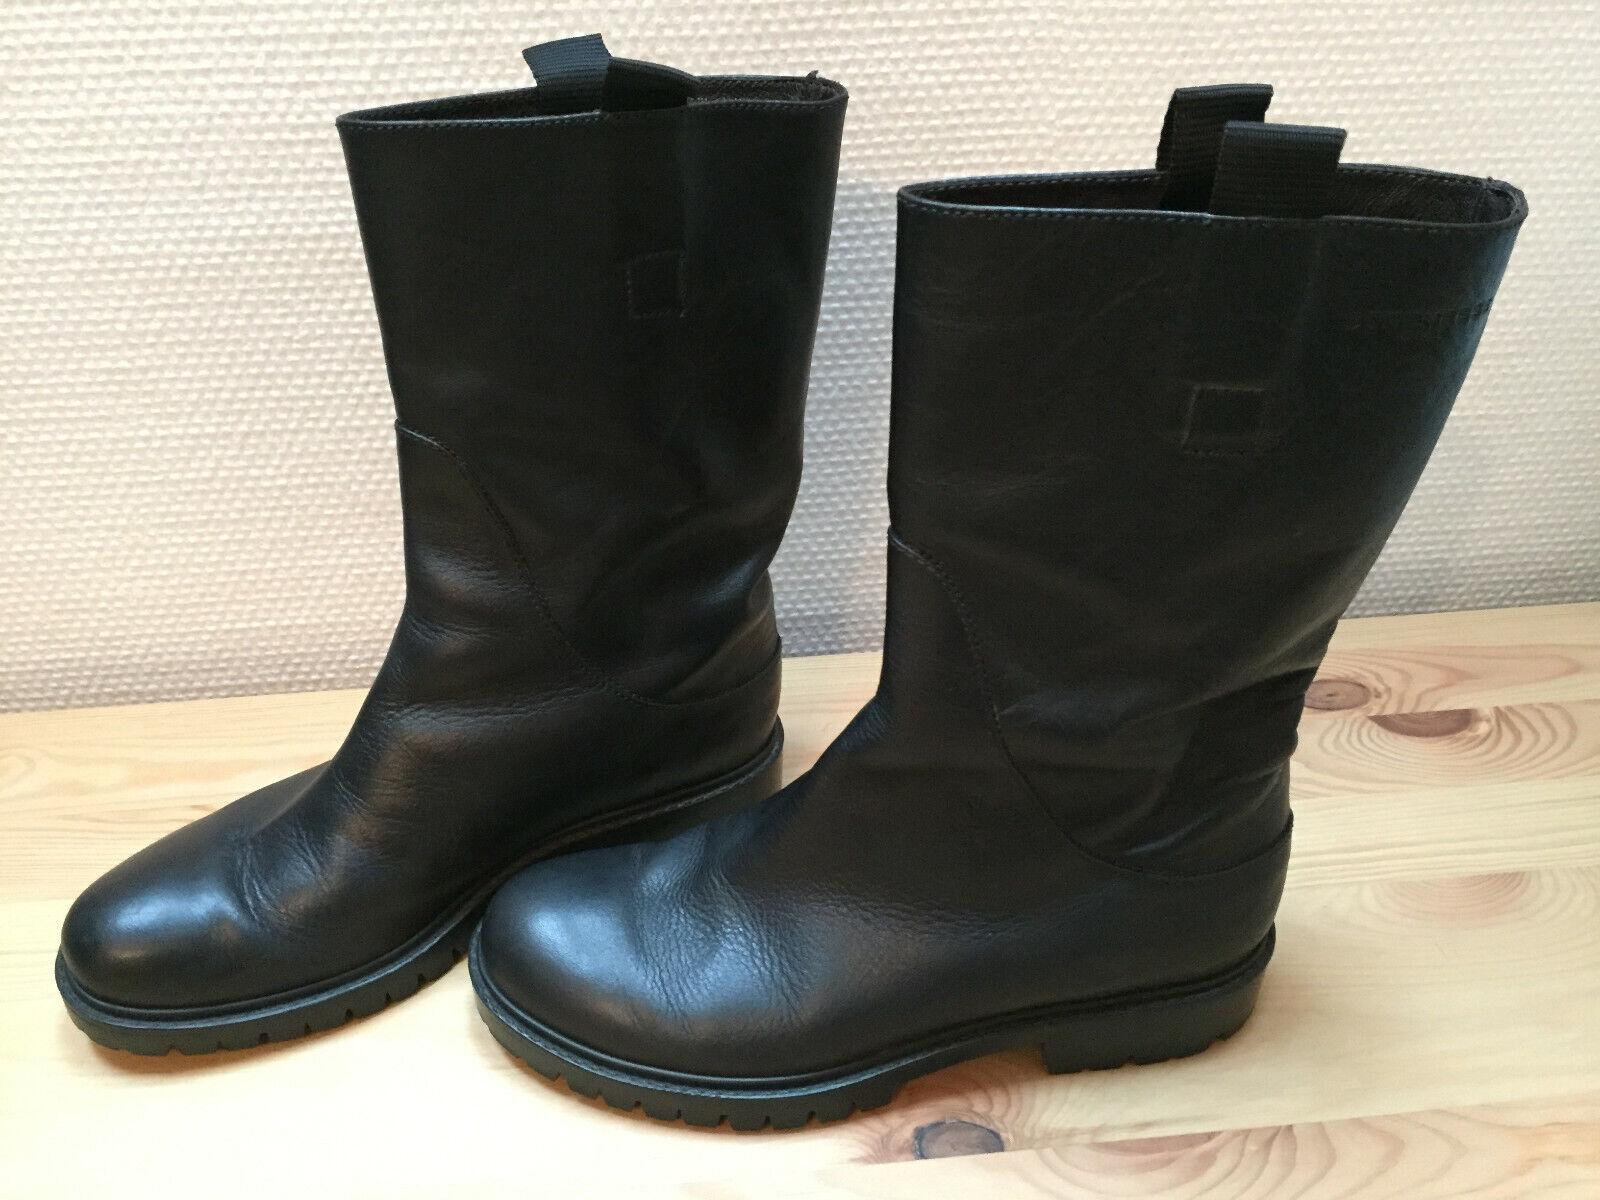 STRENESSE Blau Damen-Lederstiefel Stiefelette Stiefel Gr. 37 schwarz - TOP